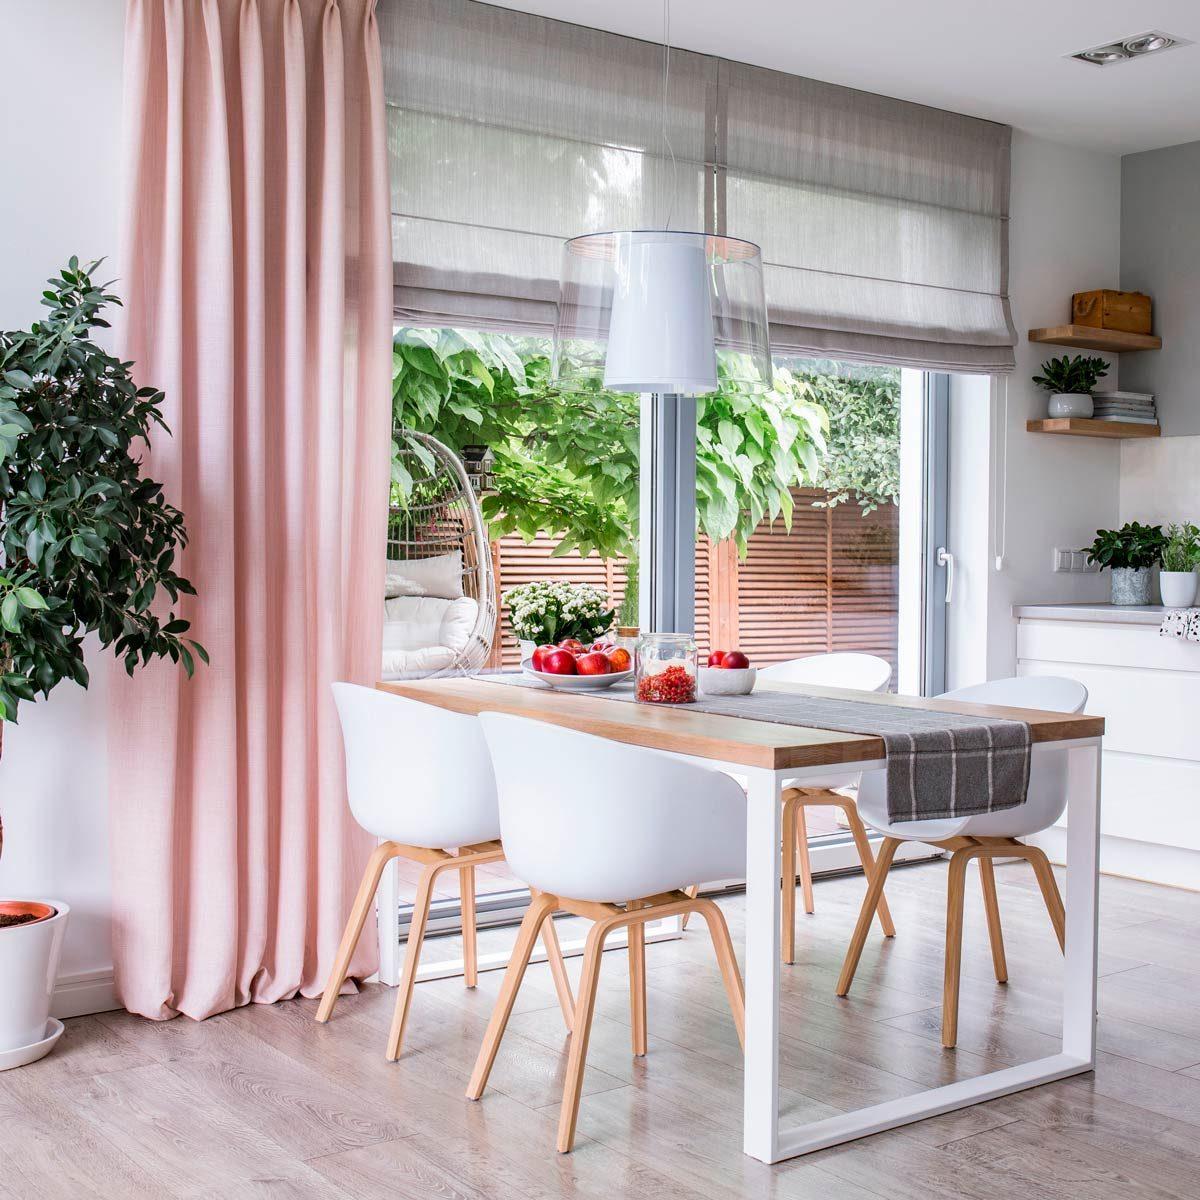 Stylish Dining Room Curtain Ideas | Family Handyman on Dining Room Curtain Ideas  id=18283